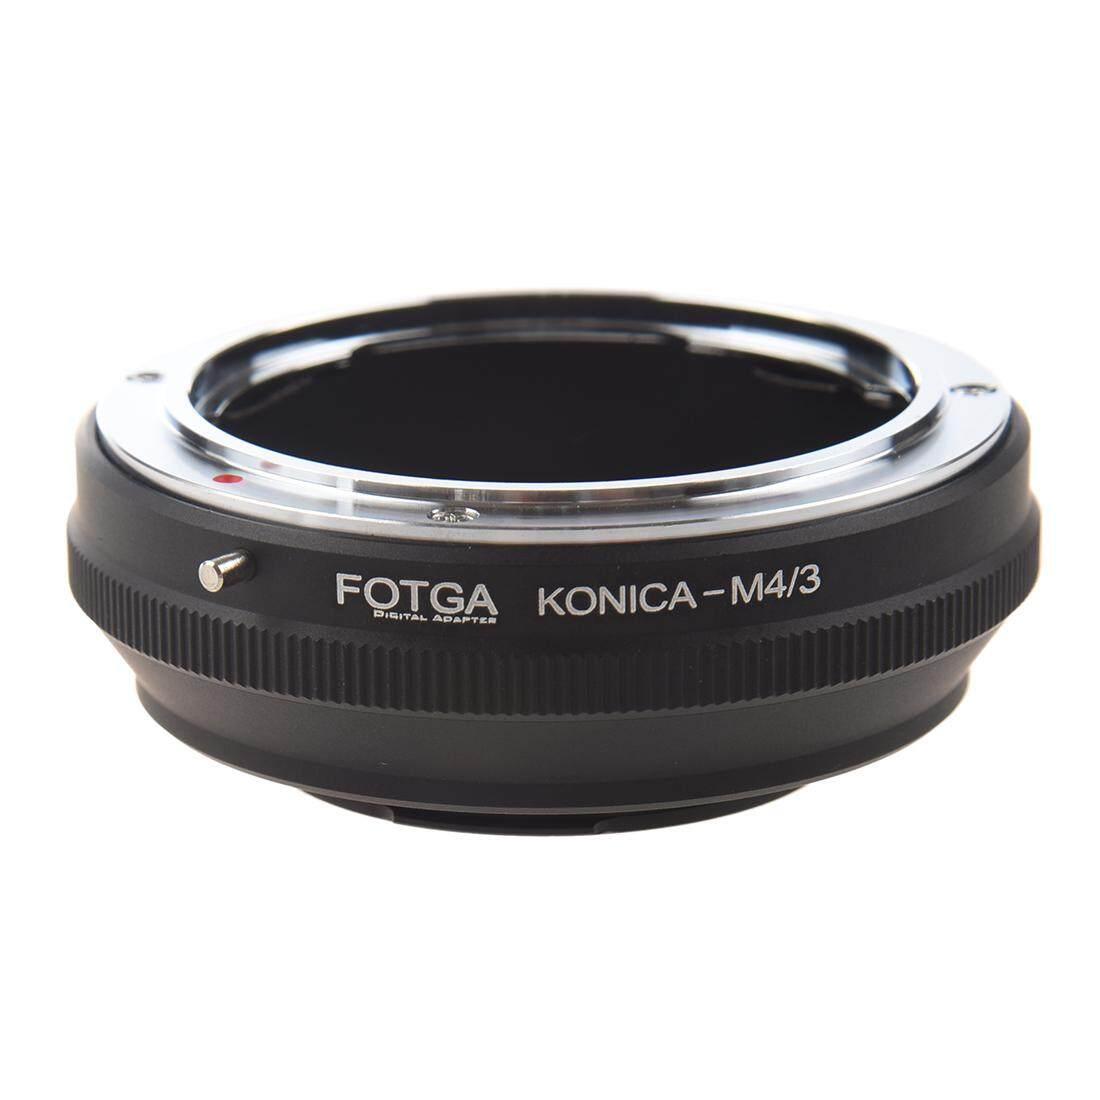 FOTGA Konica-M4/3 Adapter Digital Ring Konica AR Mount Lens to Mini 4/3 Mount Camera (for Panasonic G1 G2 G3 G5 GH1 GH2 GH3 GF1 GF2 GF3 GF5 GF6 GX1 GX2 and Olympus E-P1 E-P2 E-P3 E-P5 E-PL1 E-PL2 E-PL3 EPL5 EM-P1 EM-P2)